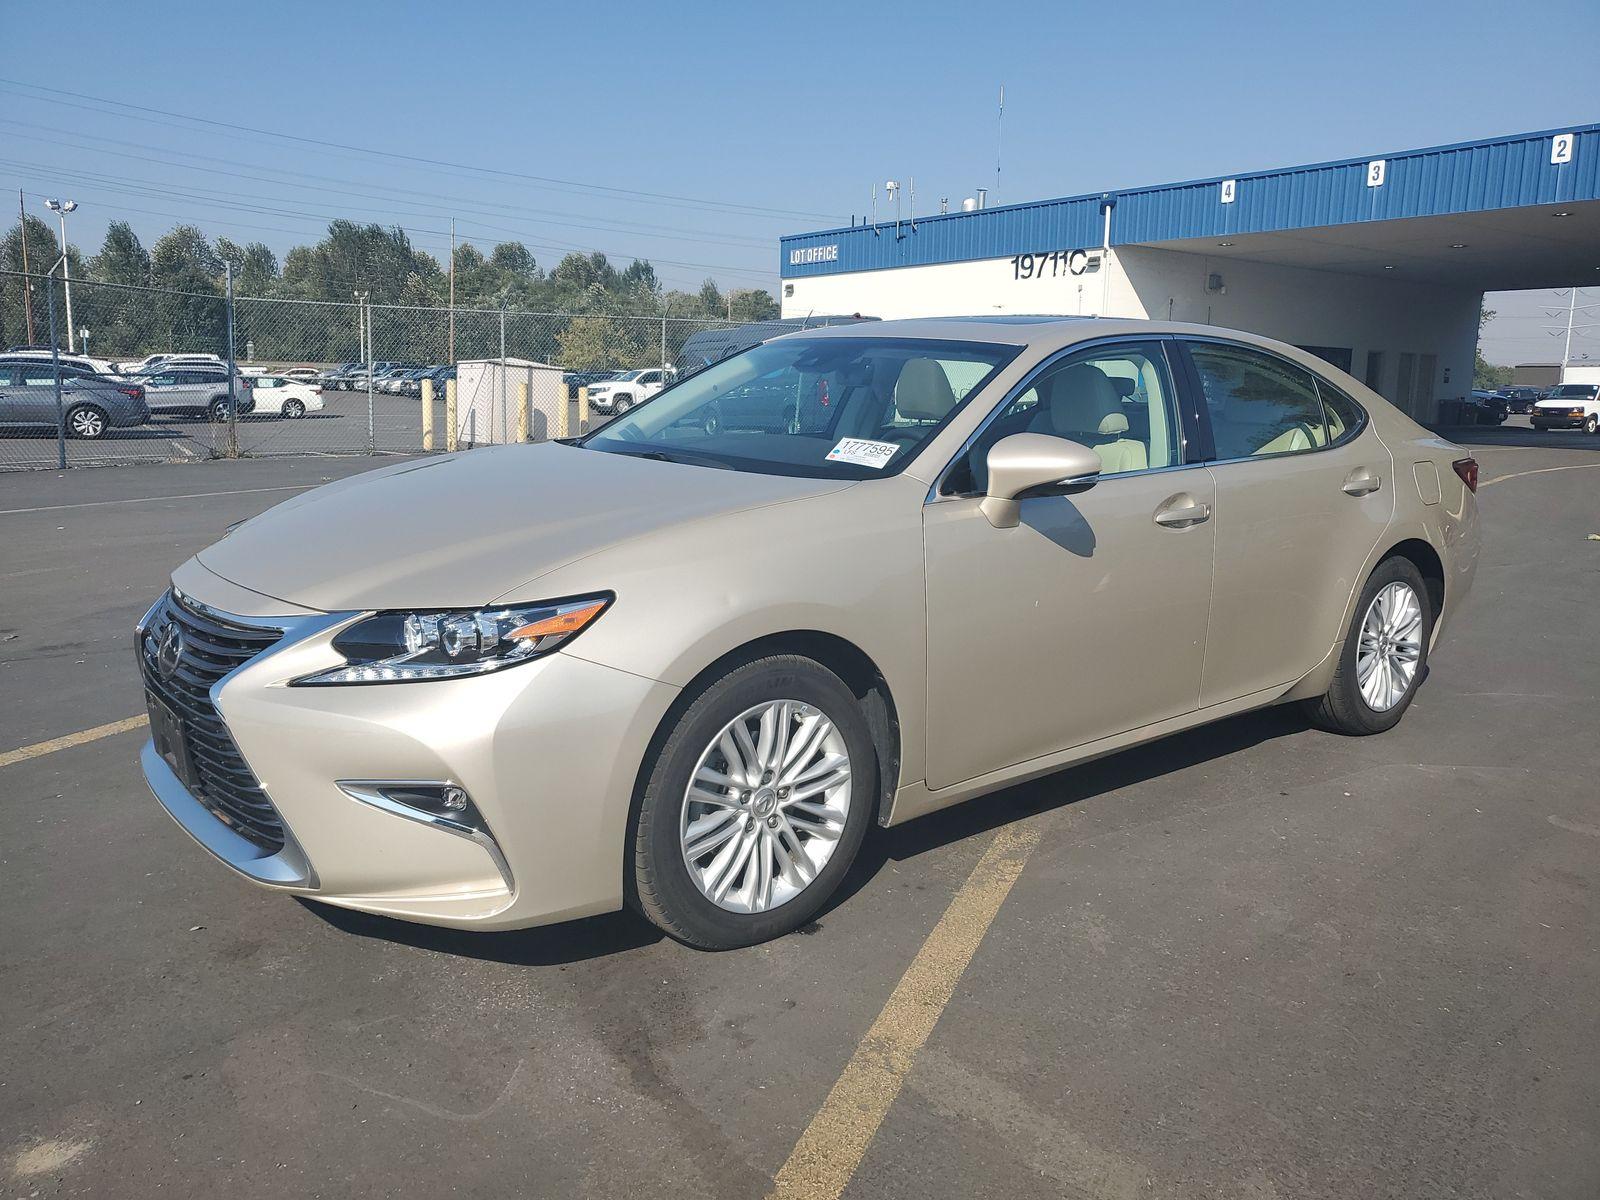 2017 Lexus ES 3.5. Lot 99912254167 Vin 58ABK1GG9HU074697